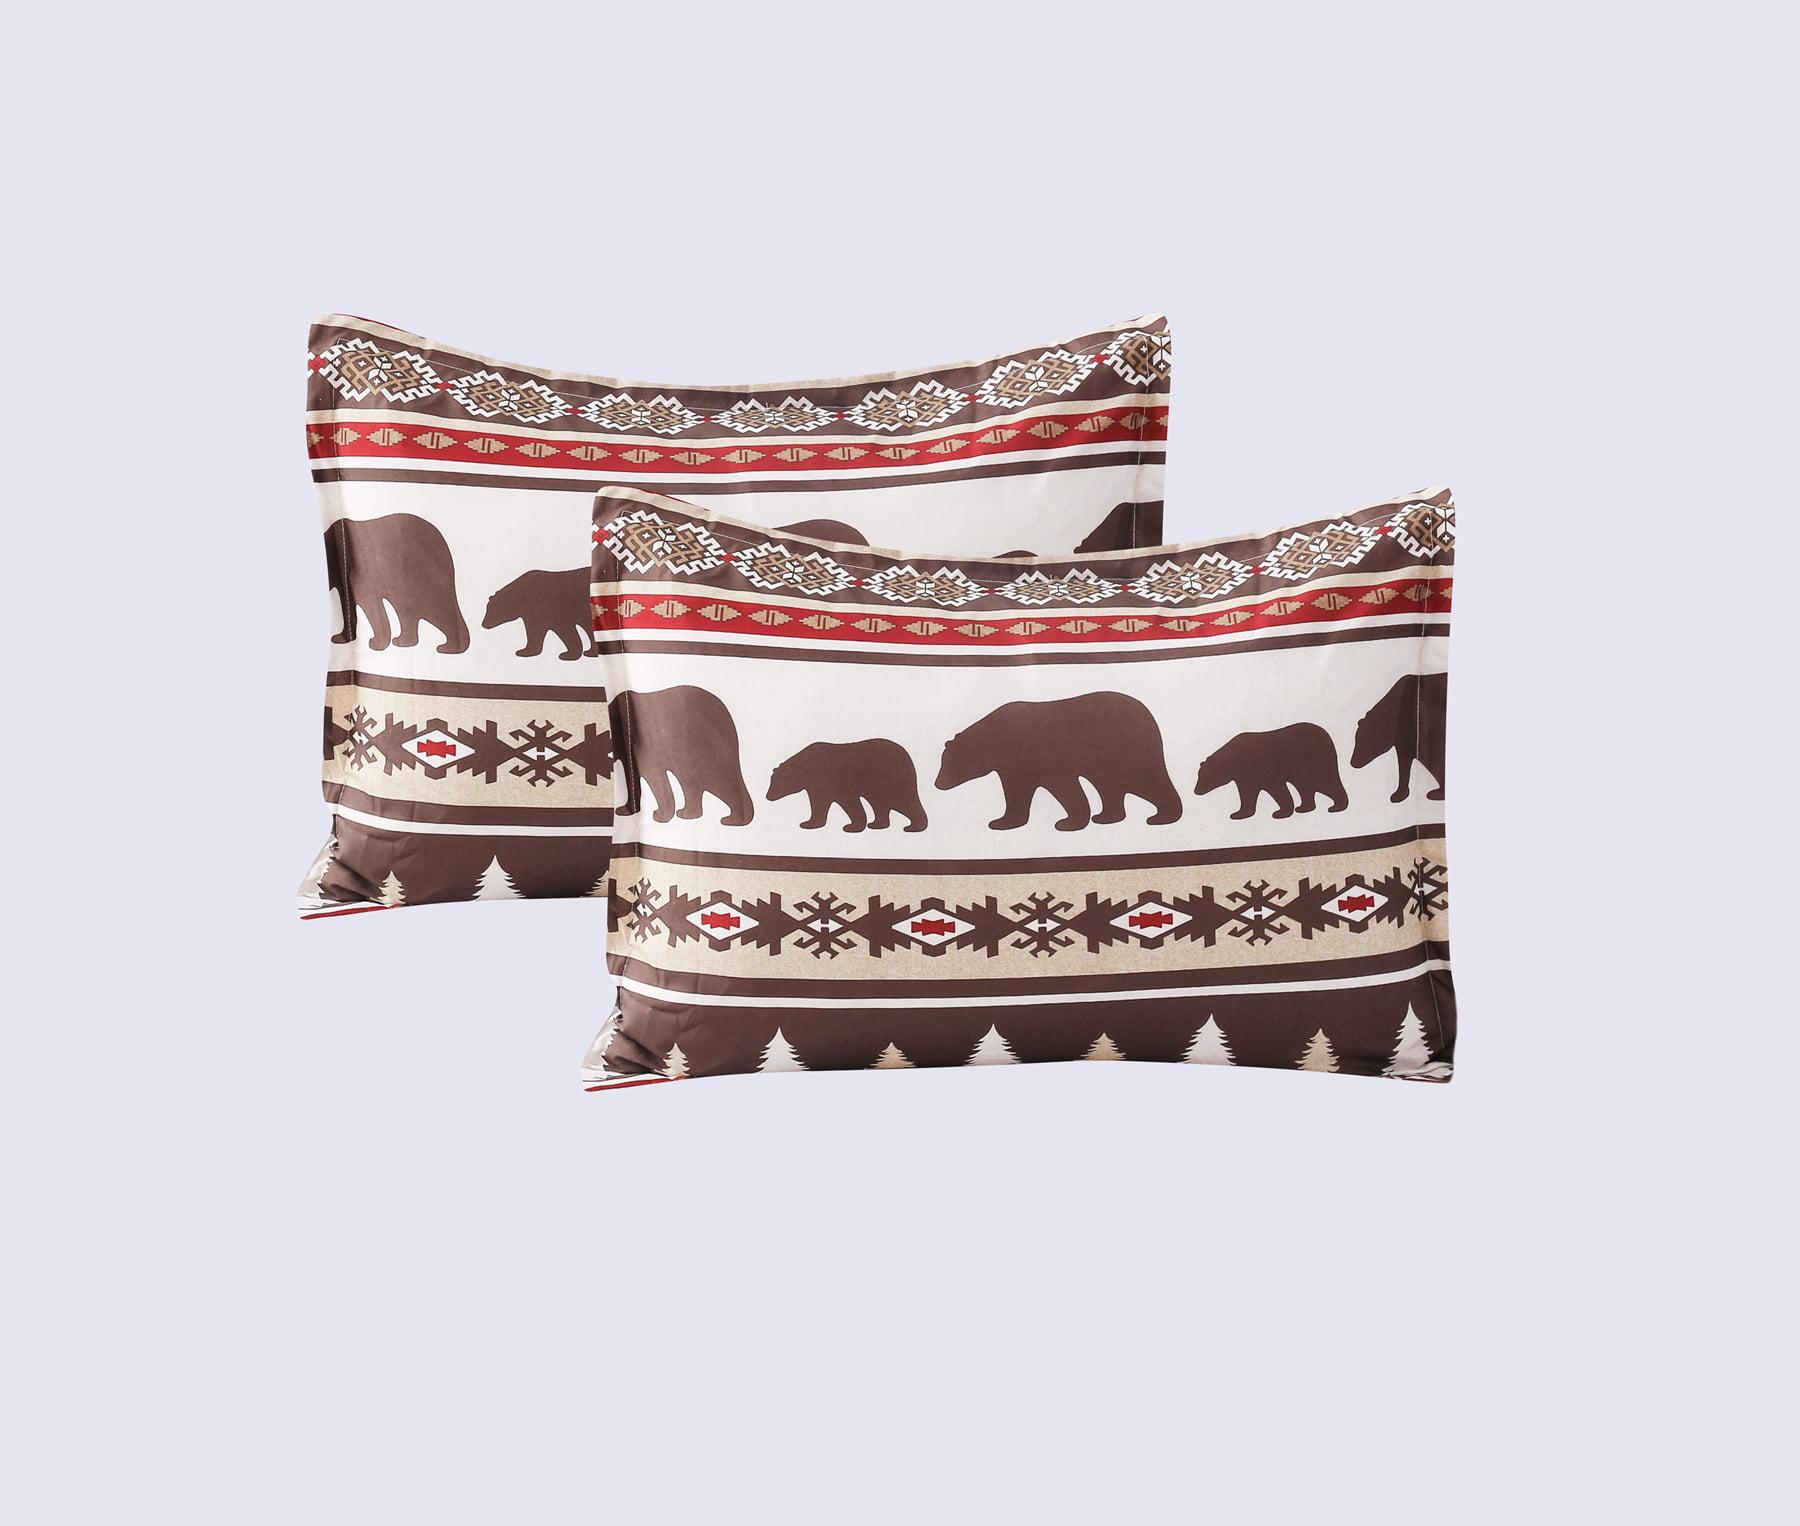 MarCielo 5 Pcs Bohemian Rustic Lodge Cabin Christmas Comforter Set Yukon Queen